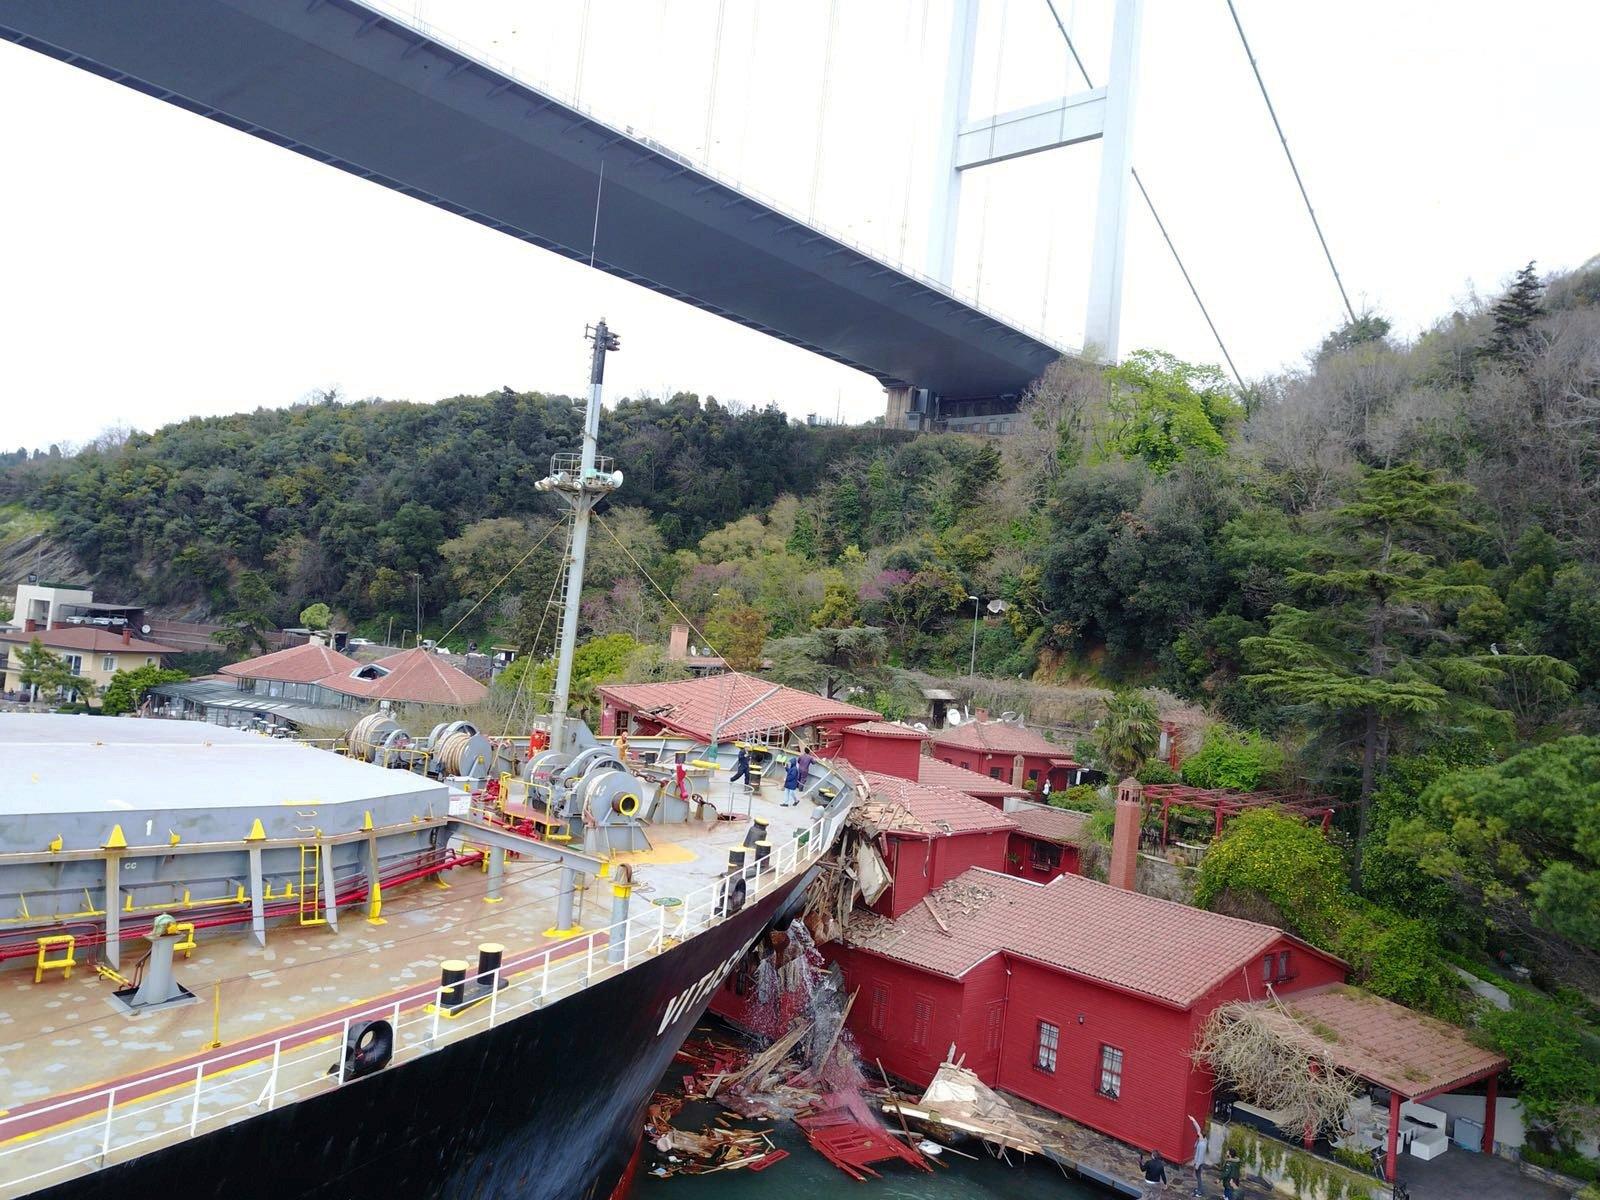 A 225-meter ship crashed into the Hekimbaşı Salih Efendi Mansion on the Bosporus, Istanbul, Turkey, on April 7, 2021. (IHA Photo)